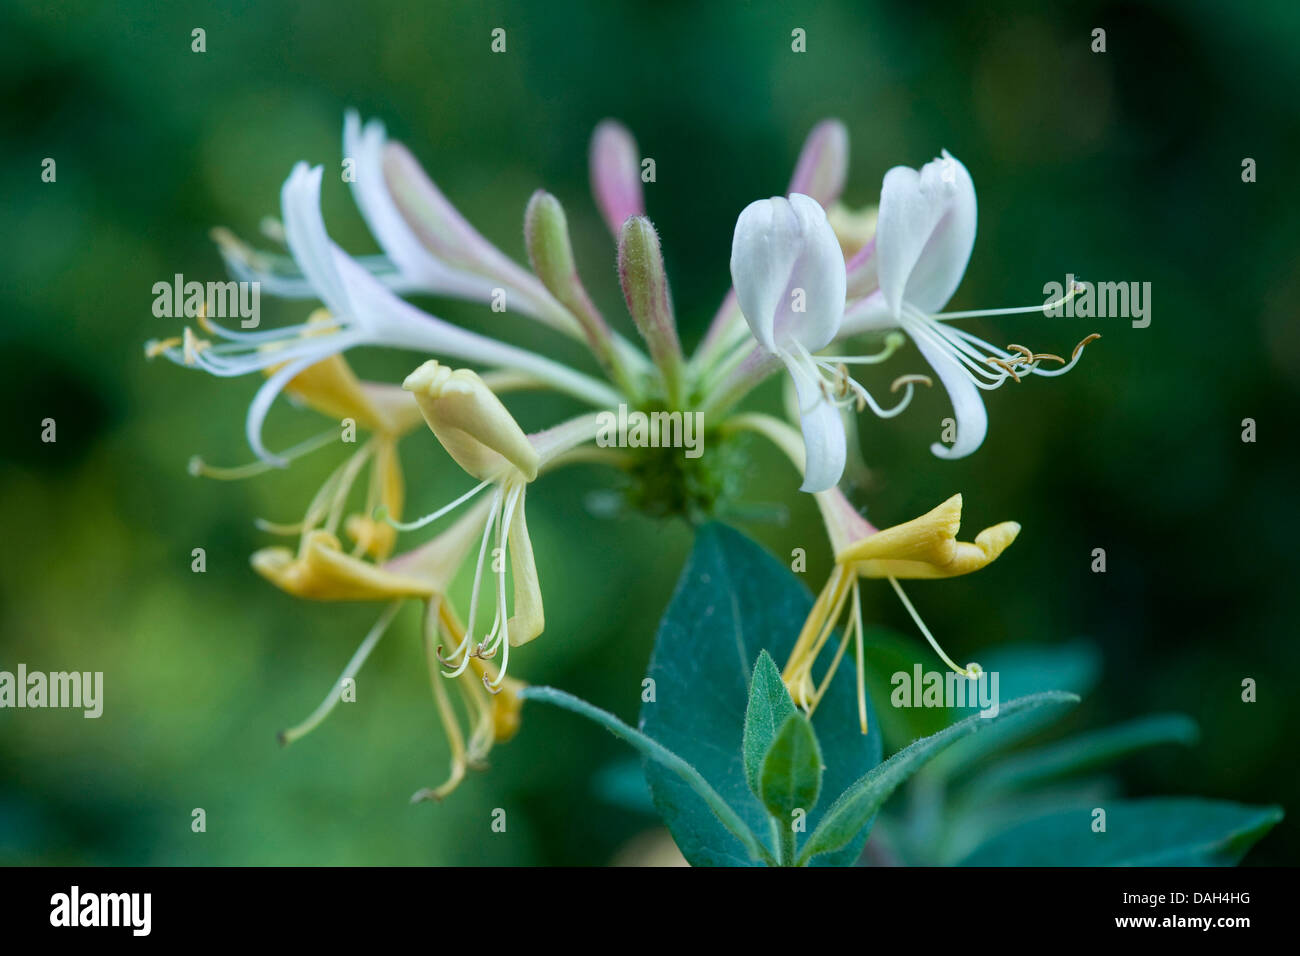 woodbine honeysuckle, English wild honeysuckle (Lonicera periclymenum), inflorescence, Germany Stock Photo